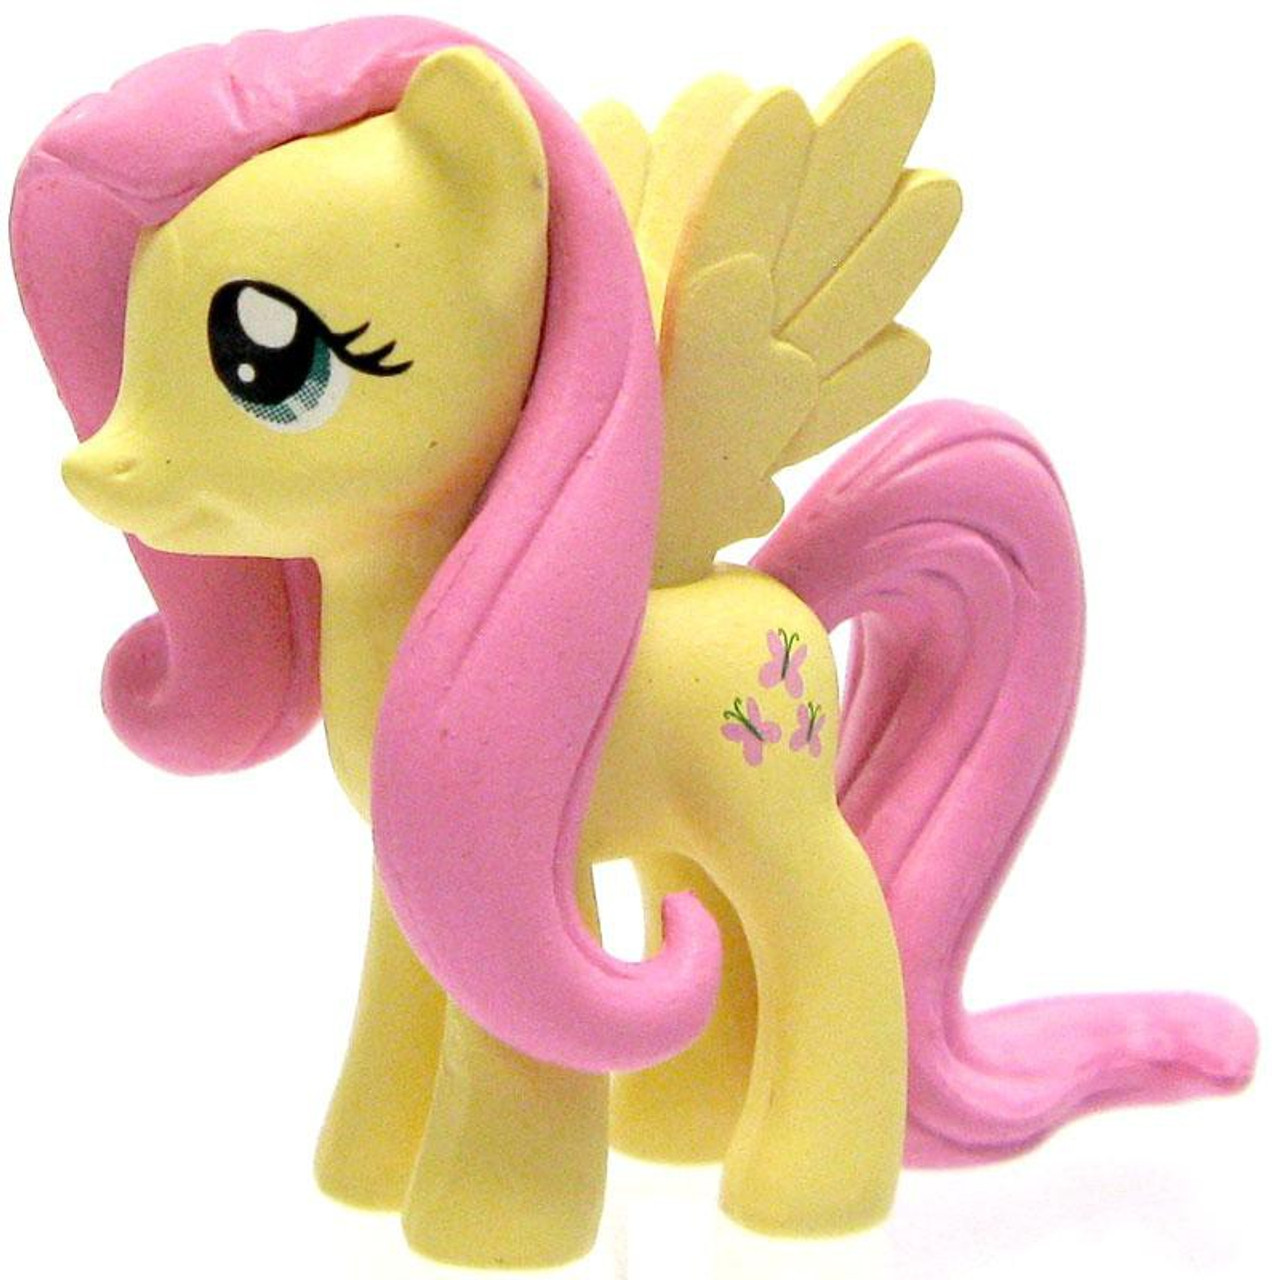 My Little Pony Monopoloy Parts Fluttershy 1.5-Inch PVC Figure [Loose]